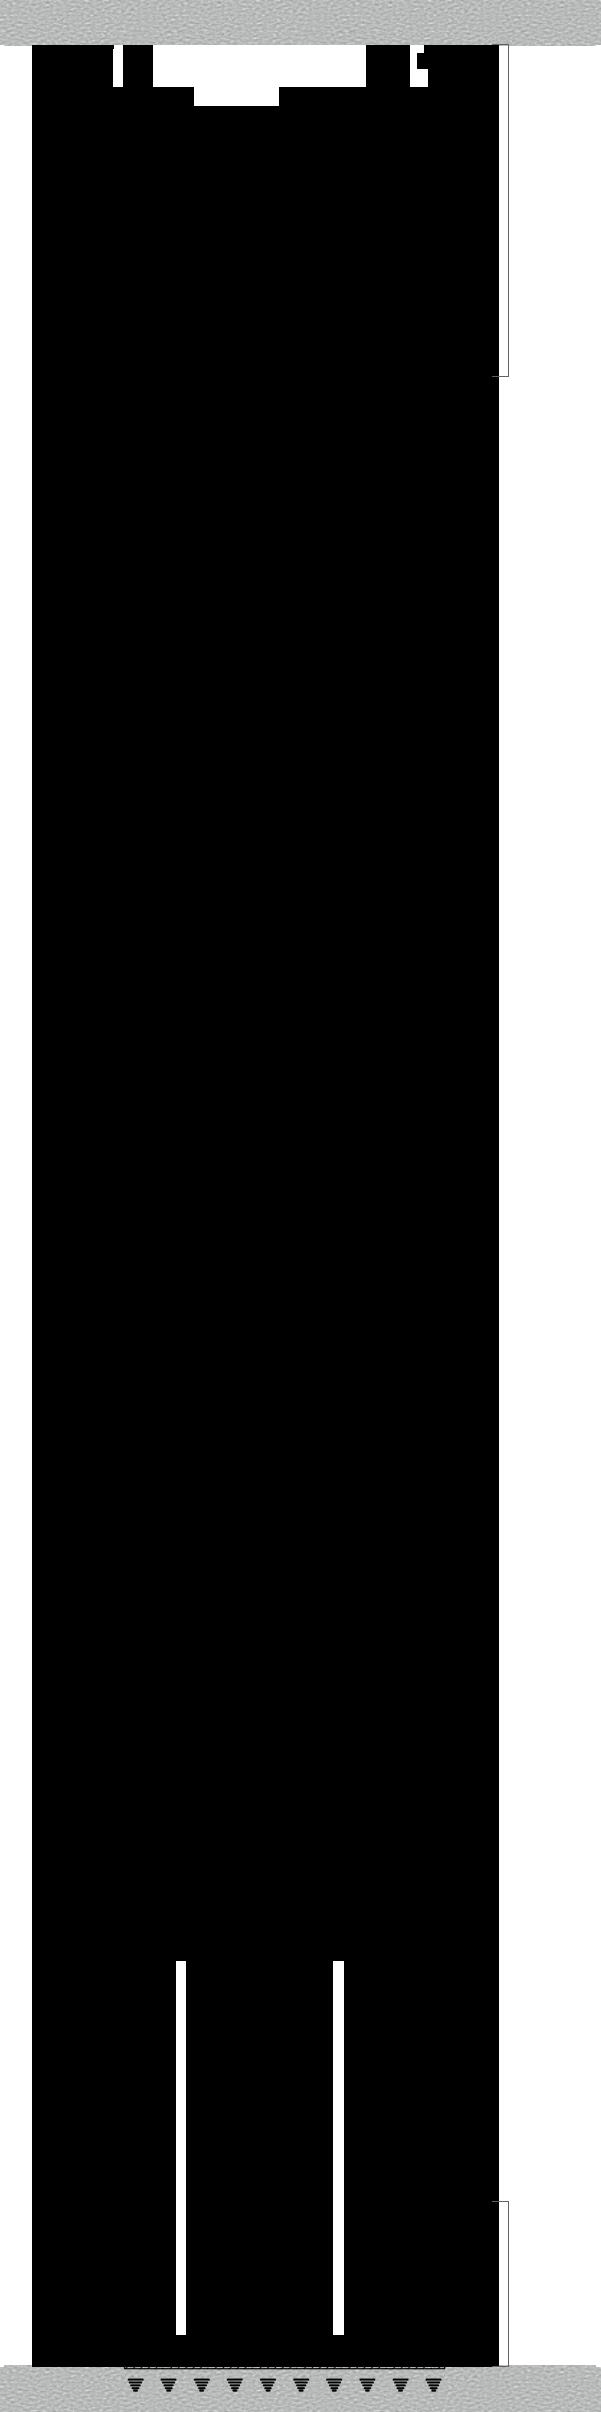 Compactliftsystems Aufzug